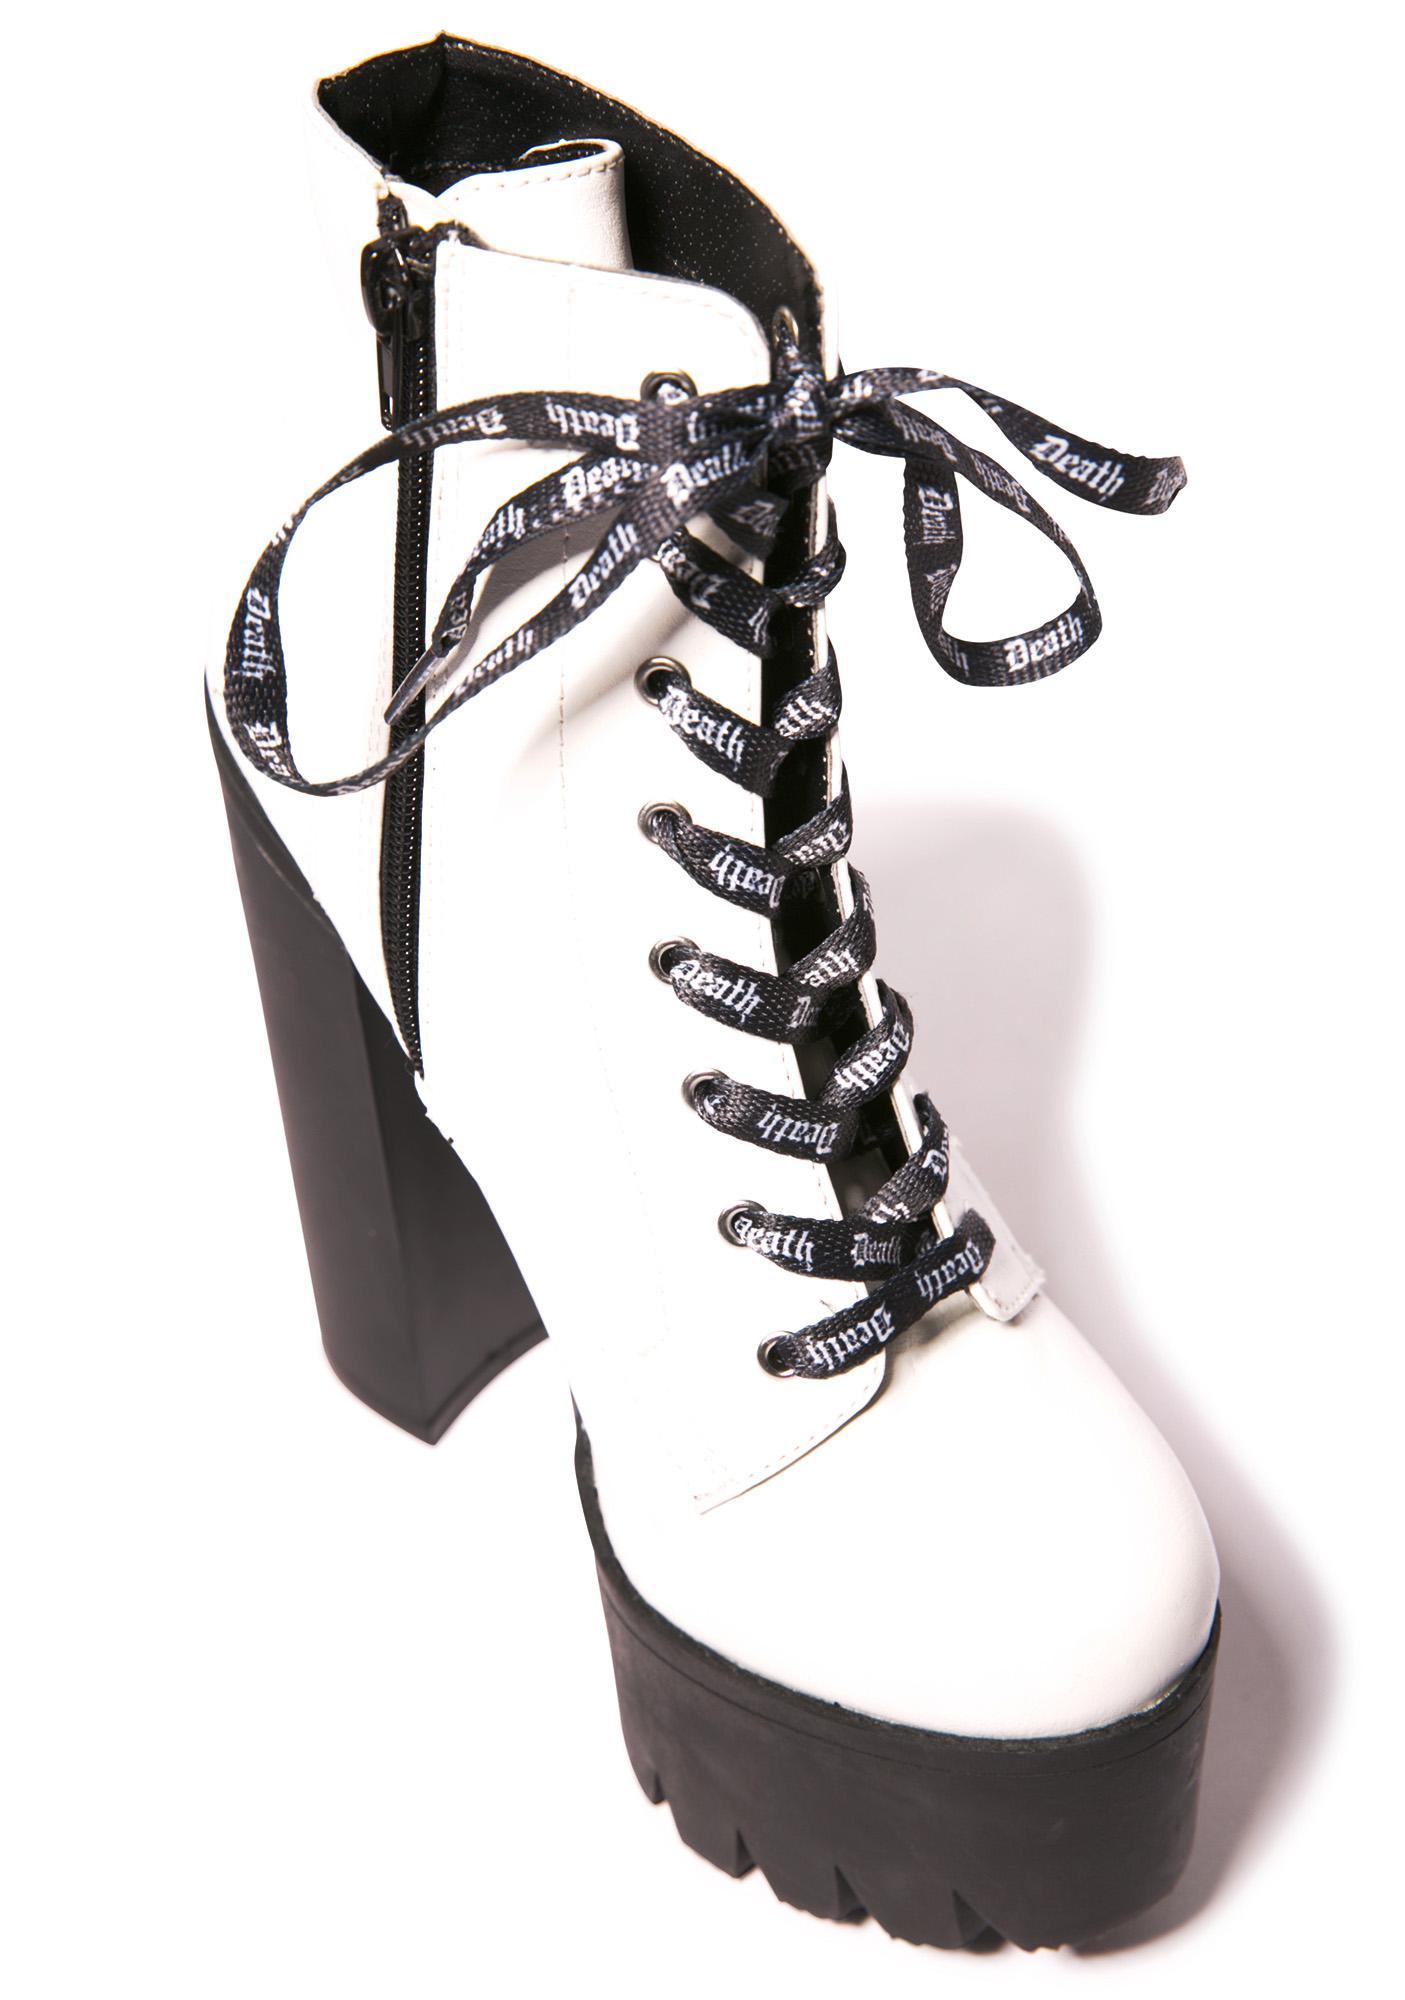 Mishka Neighborhood Sniper Shoe Laces